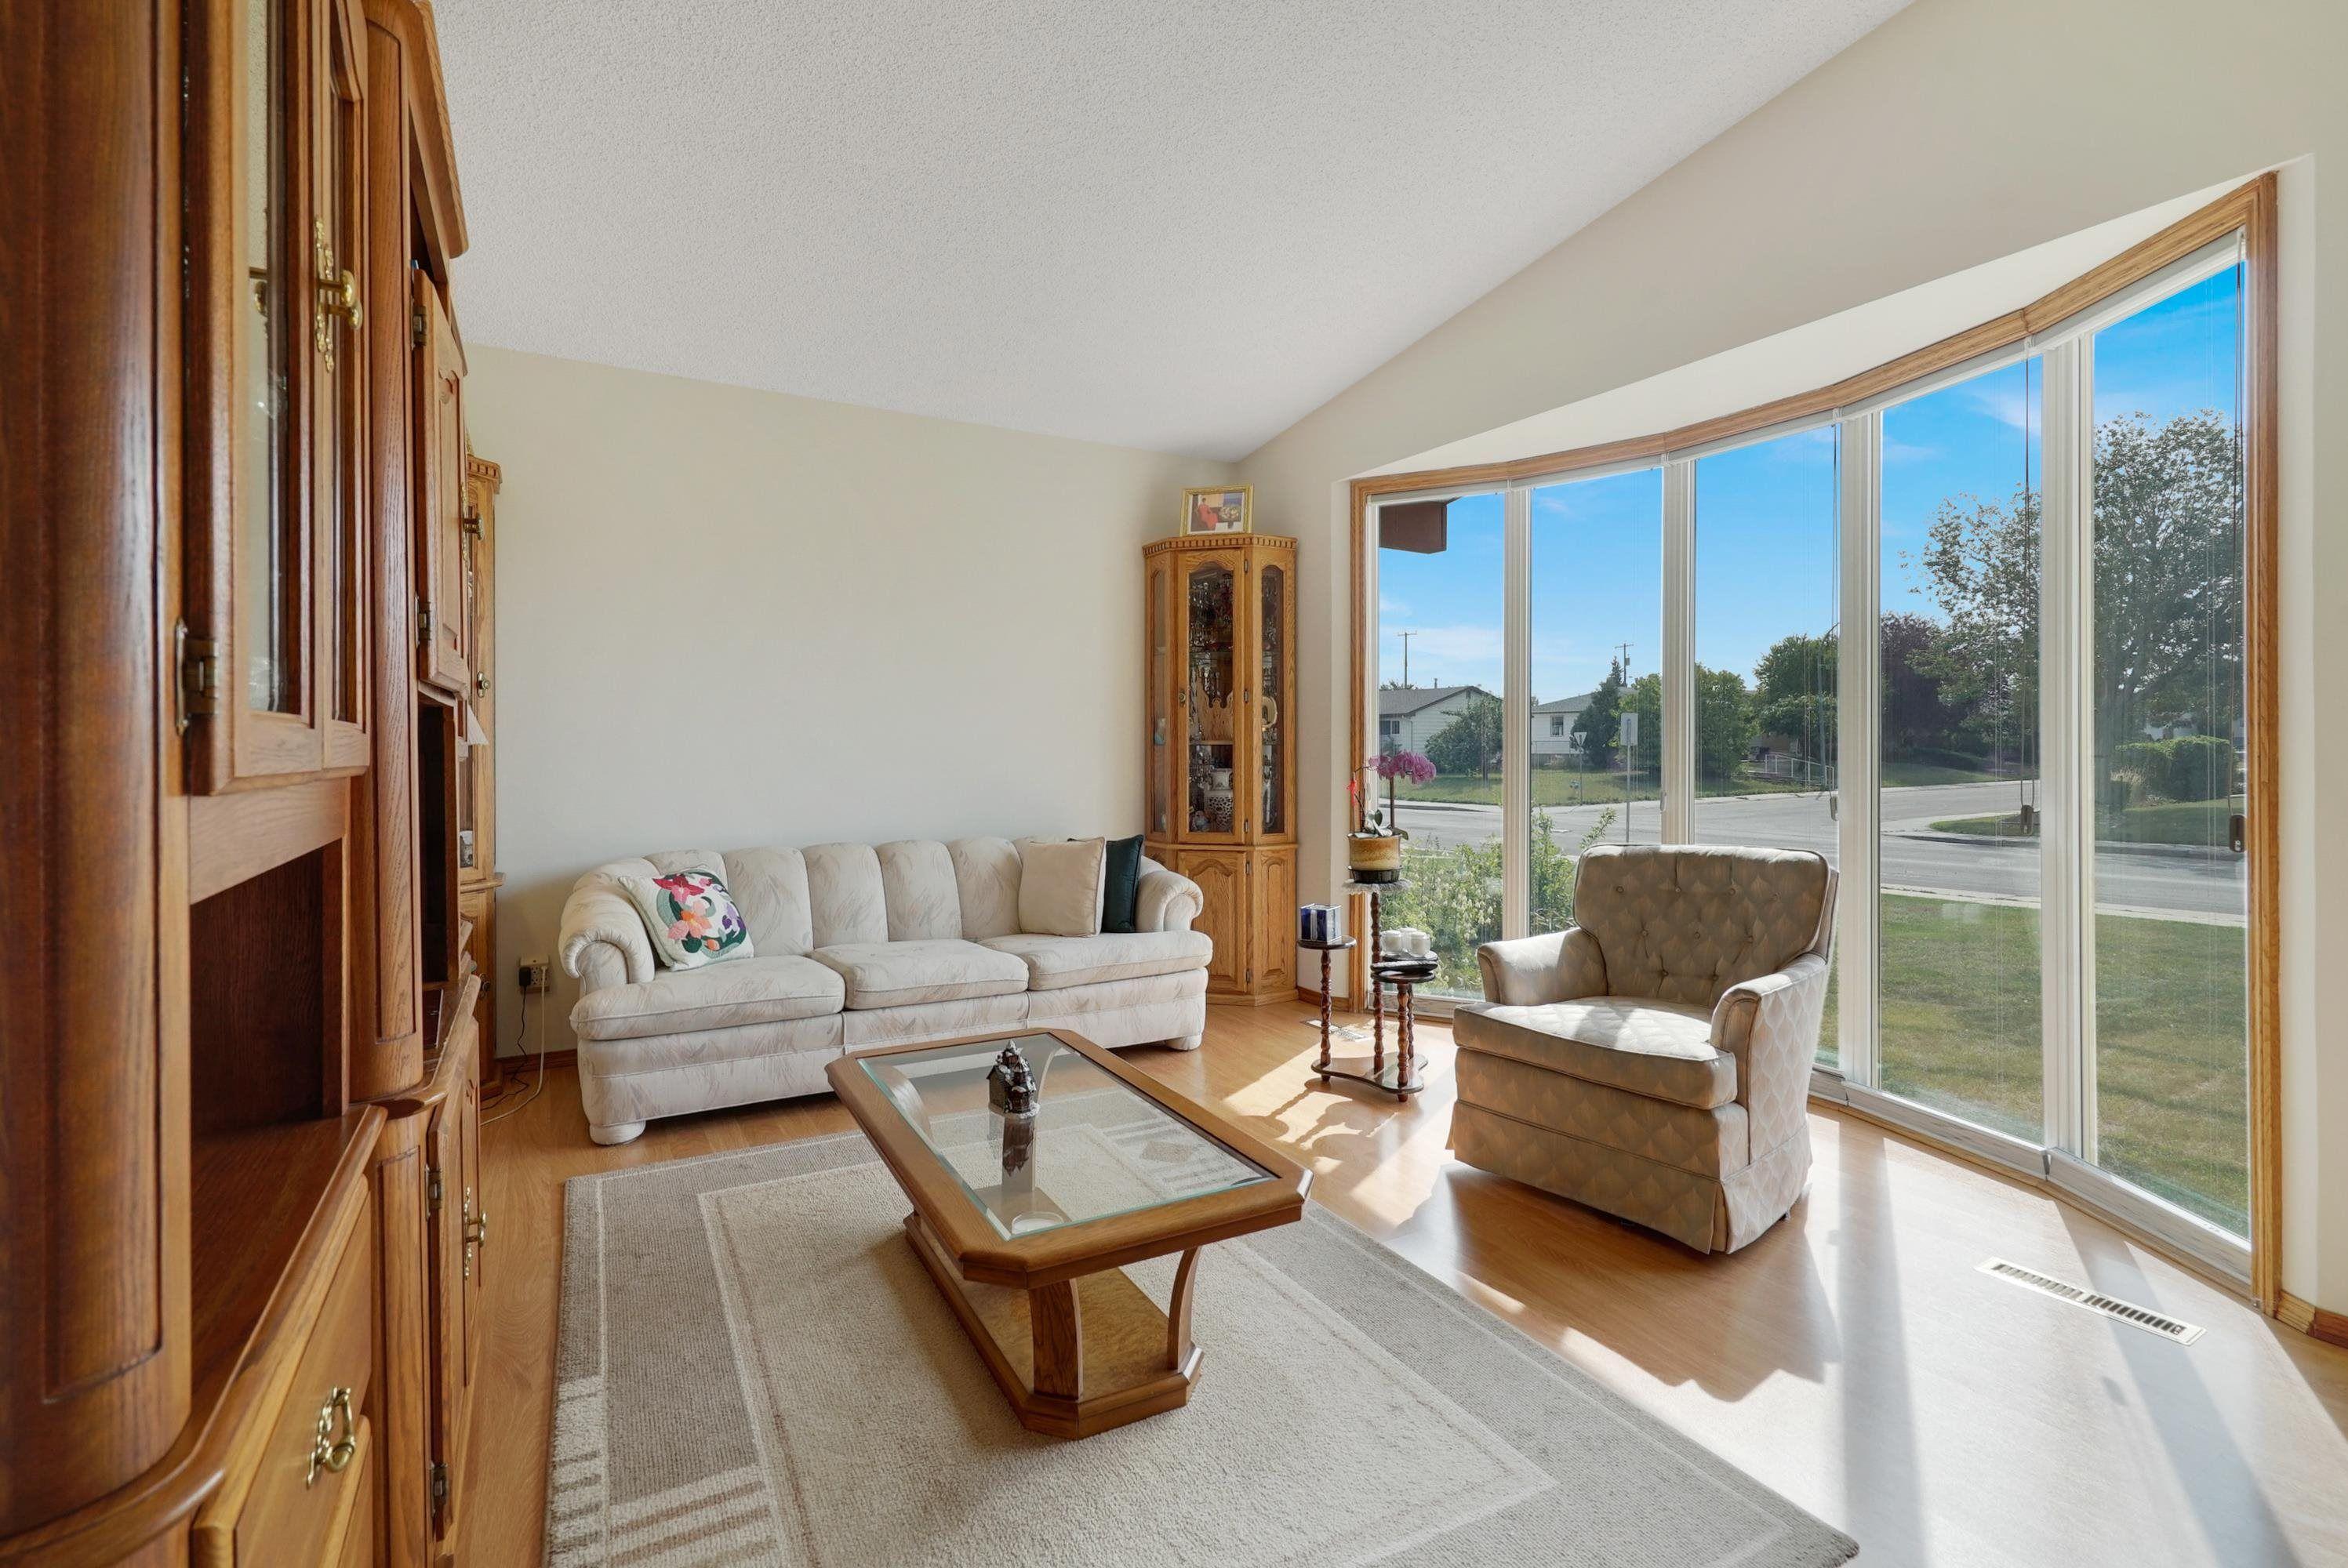 Main Photo: 6908 86 Avenue in Edmonton: Zone 18 House for sale : MLS®# E4261942